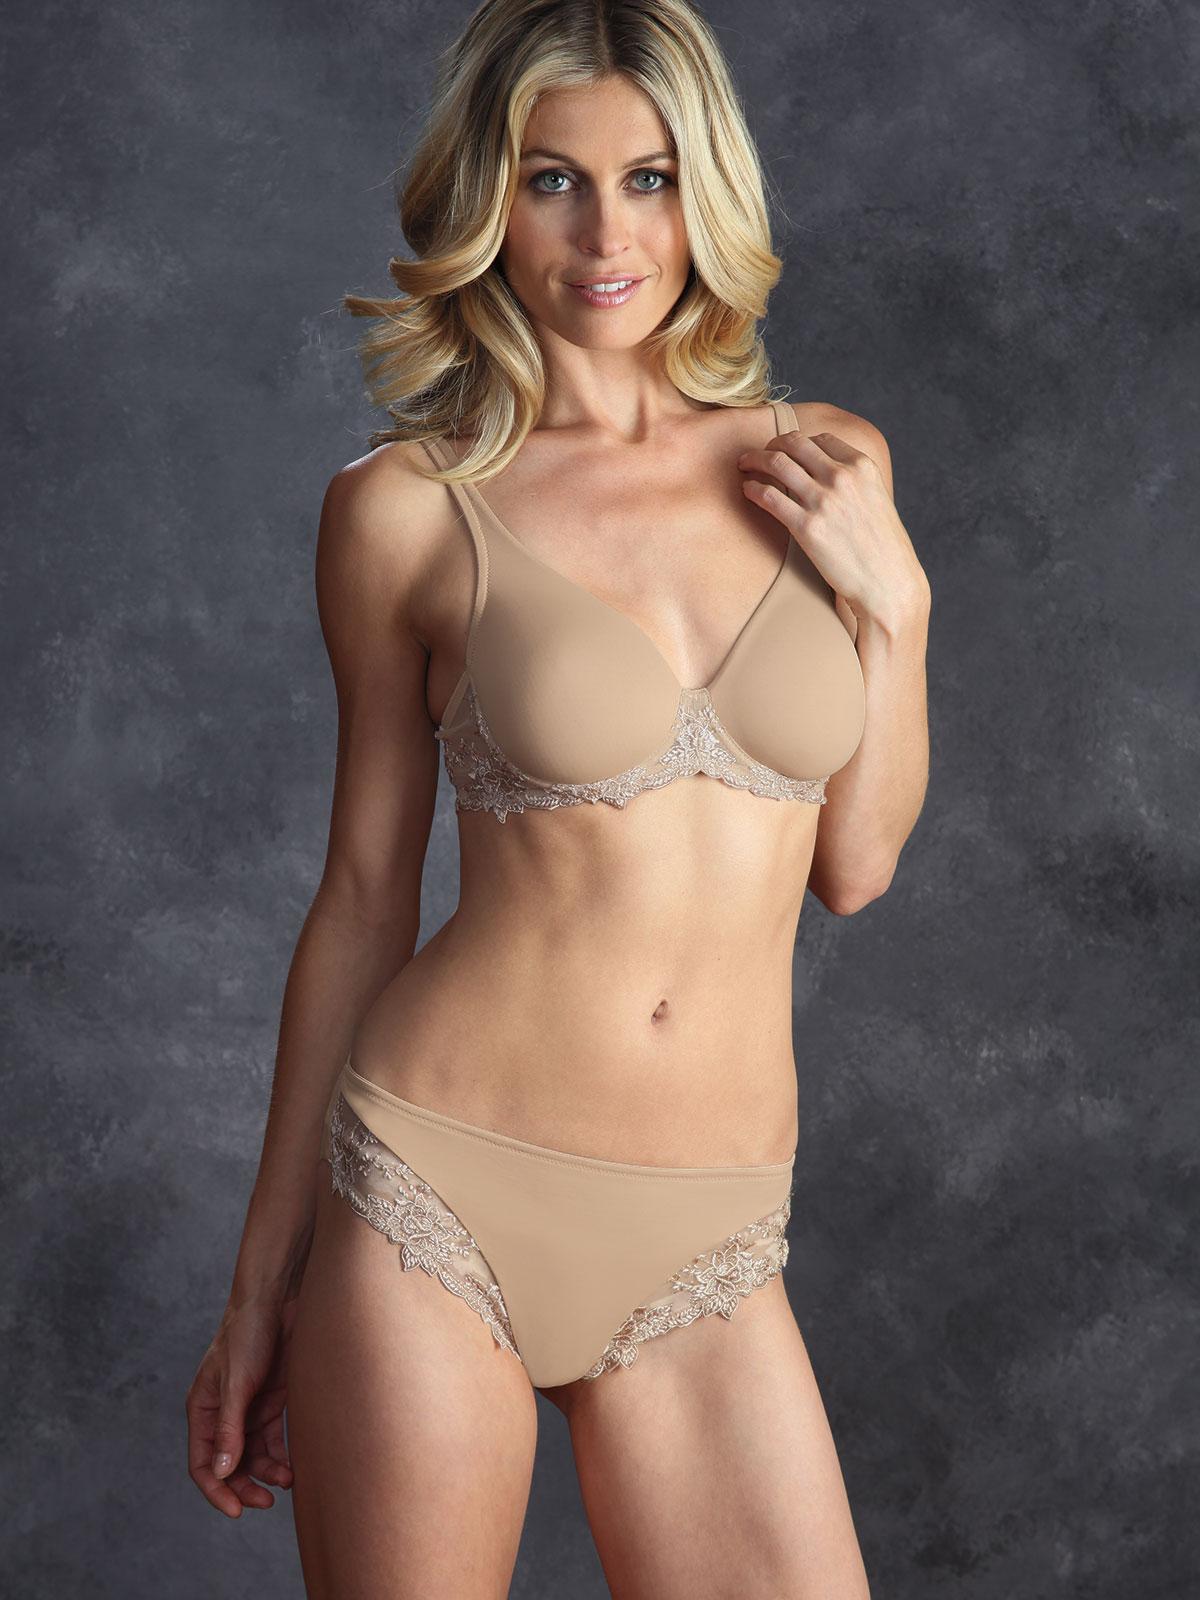 Goddess_brapanty_2826_new.jpg